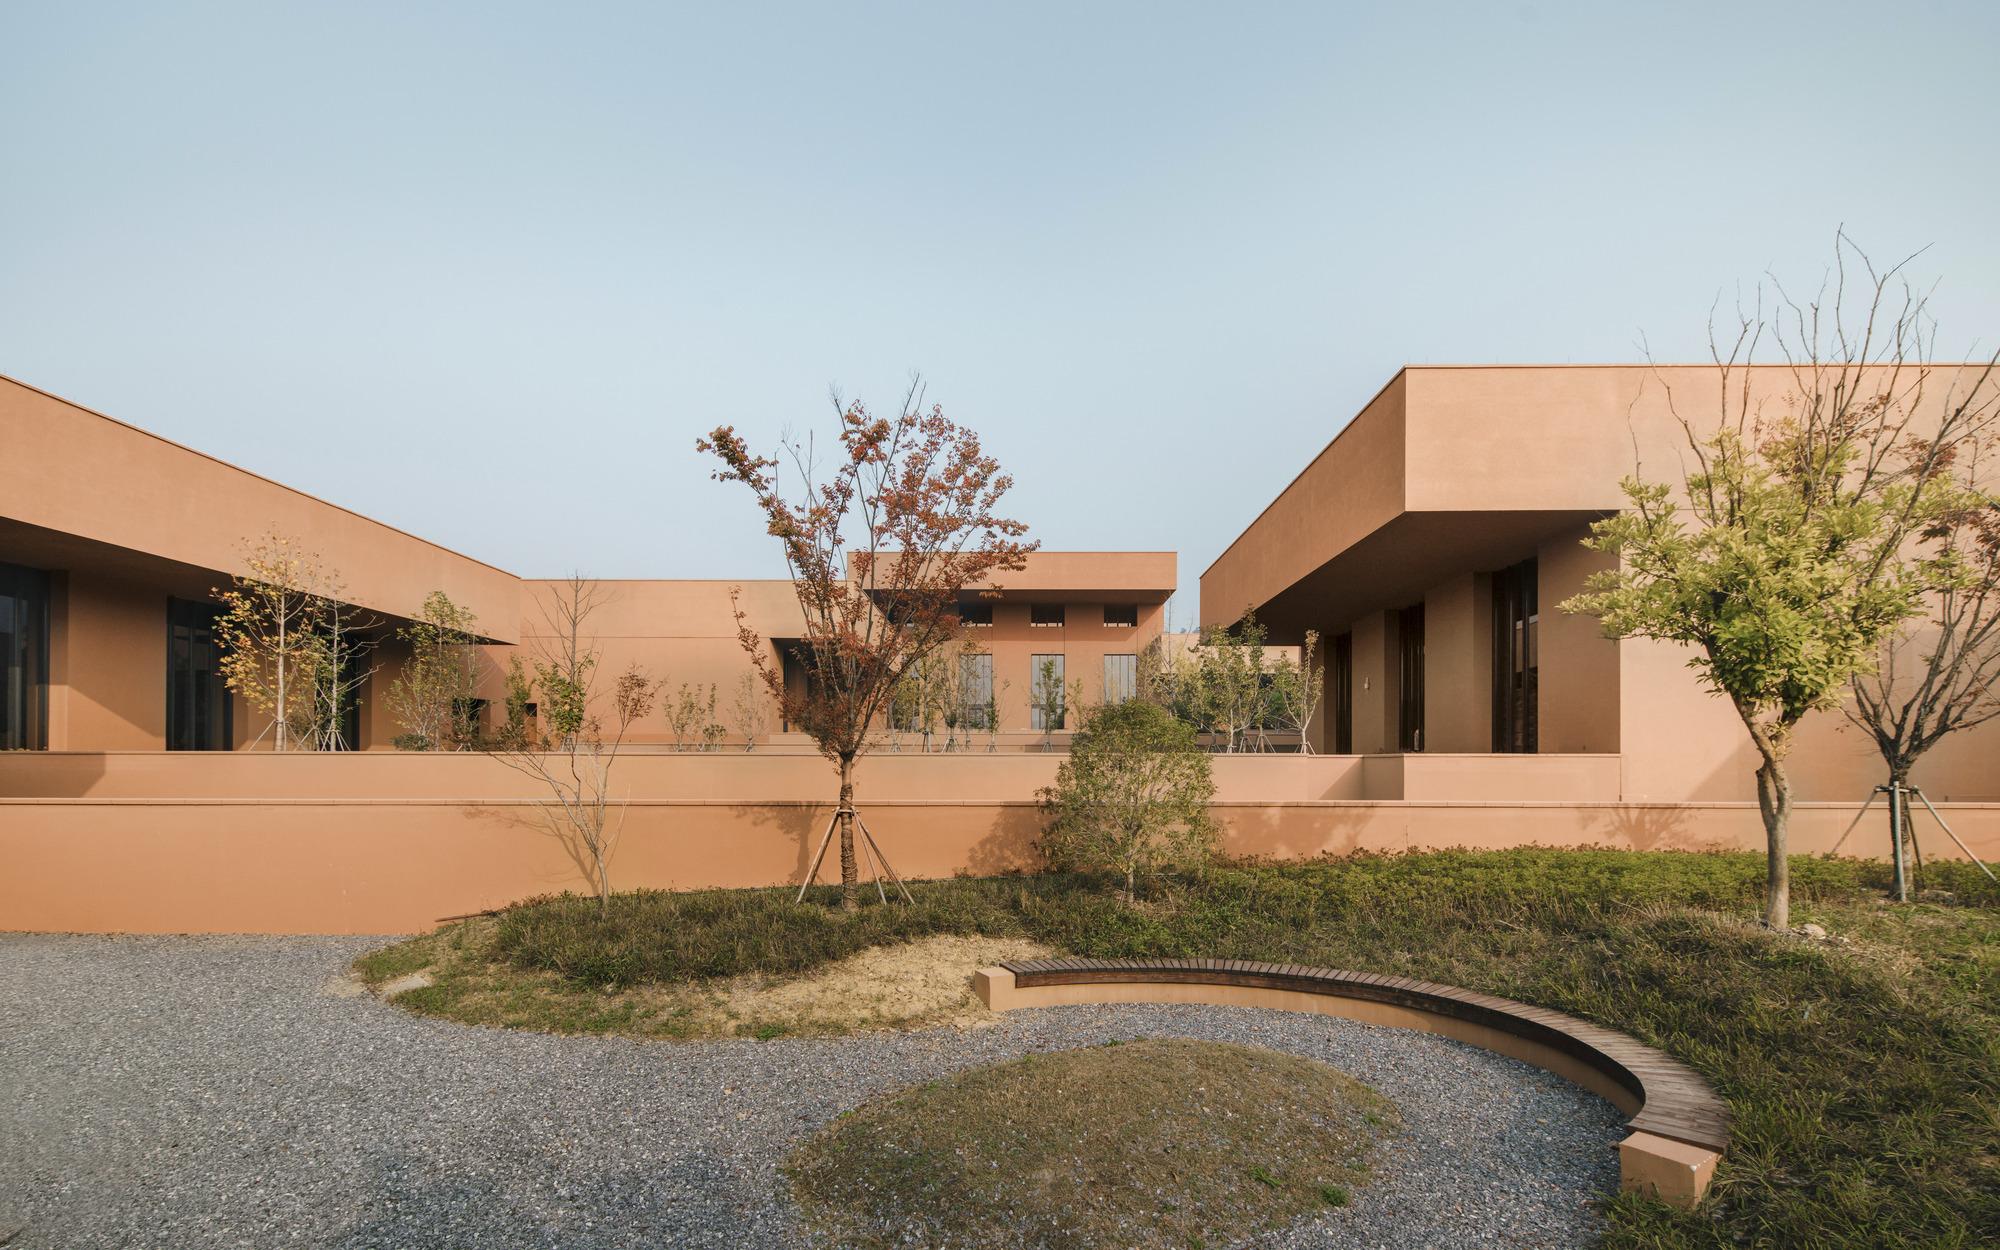 Zhejiang Museum of Natural History / David Chipperfield Architects